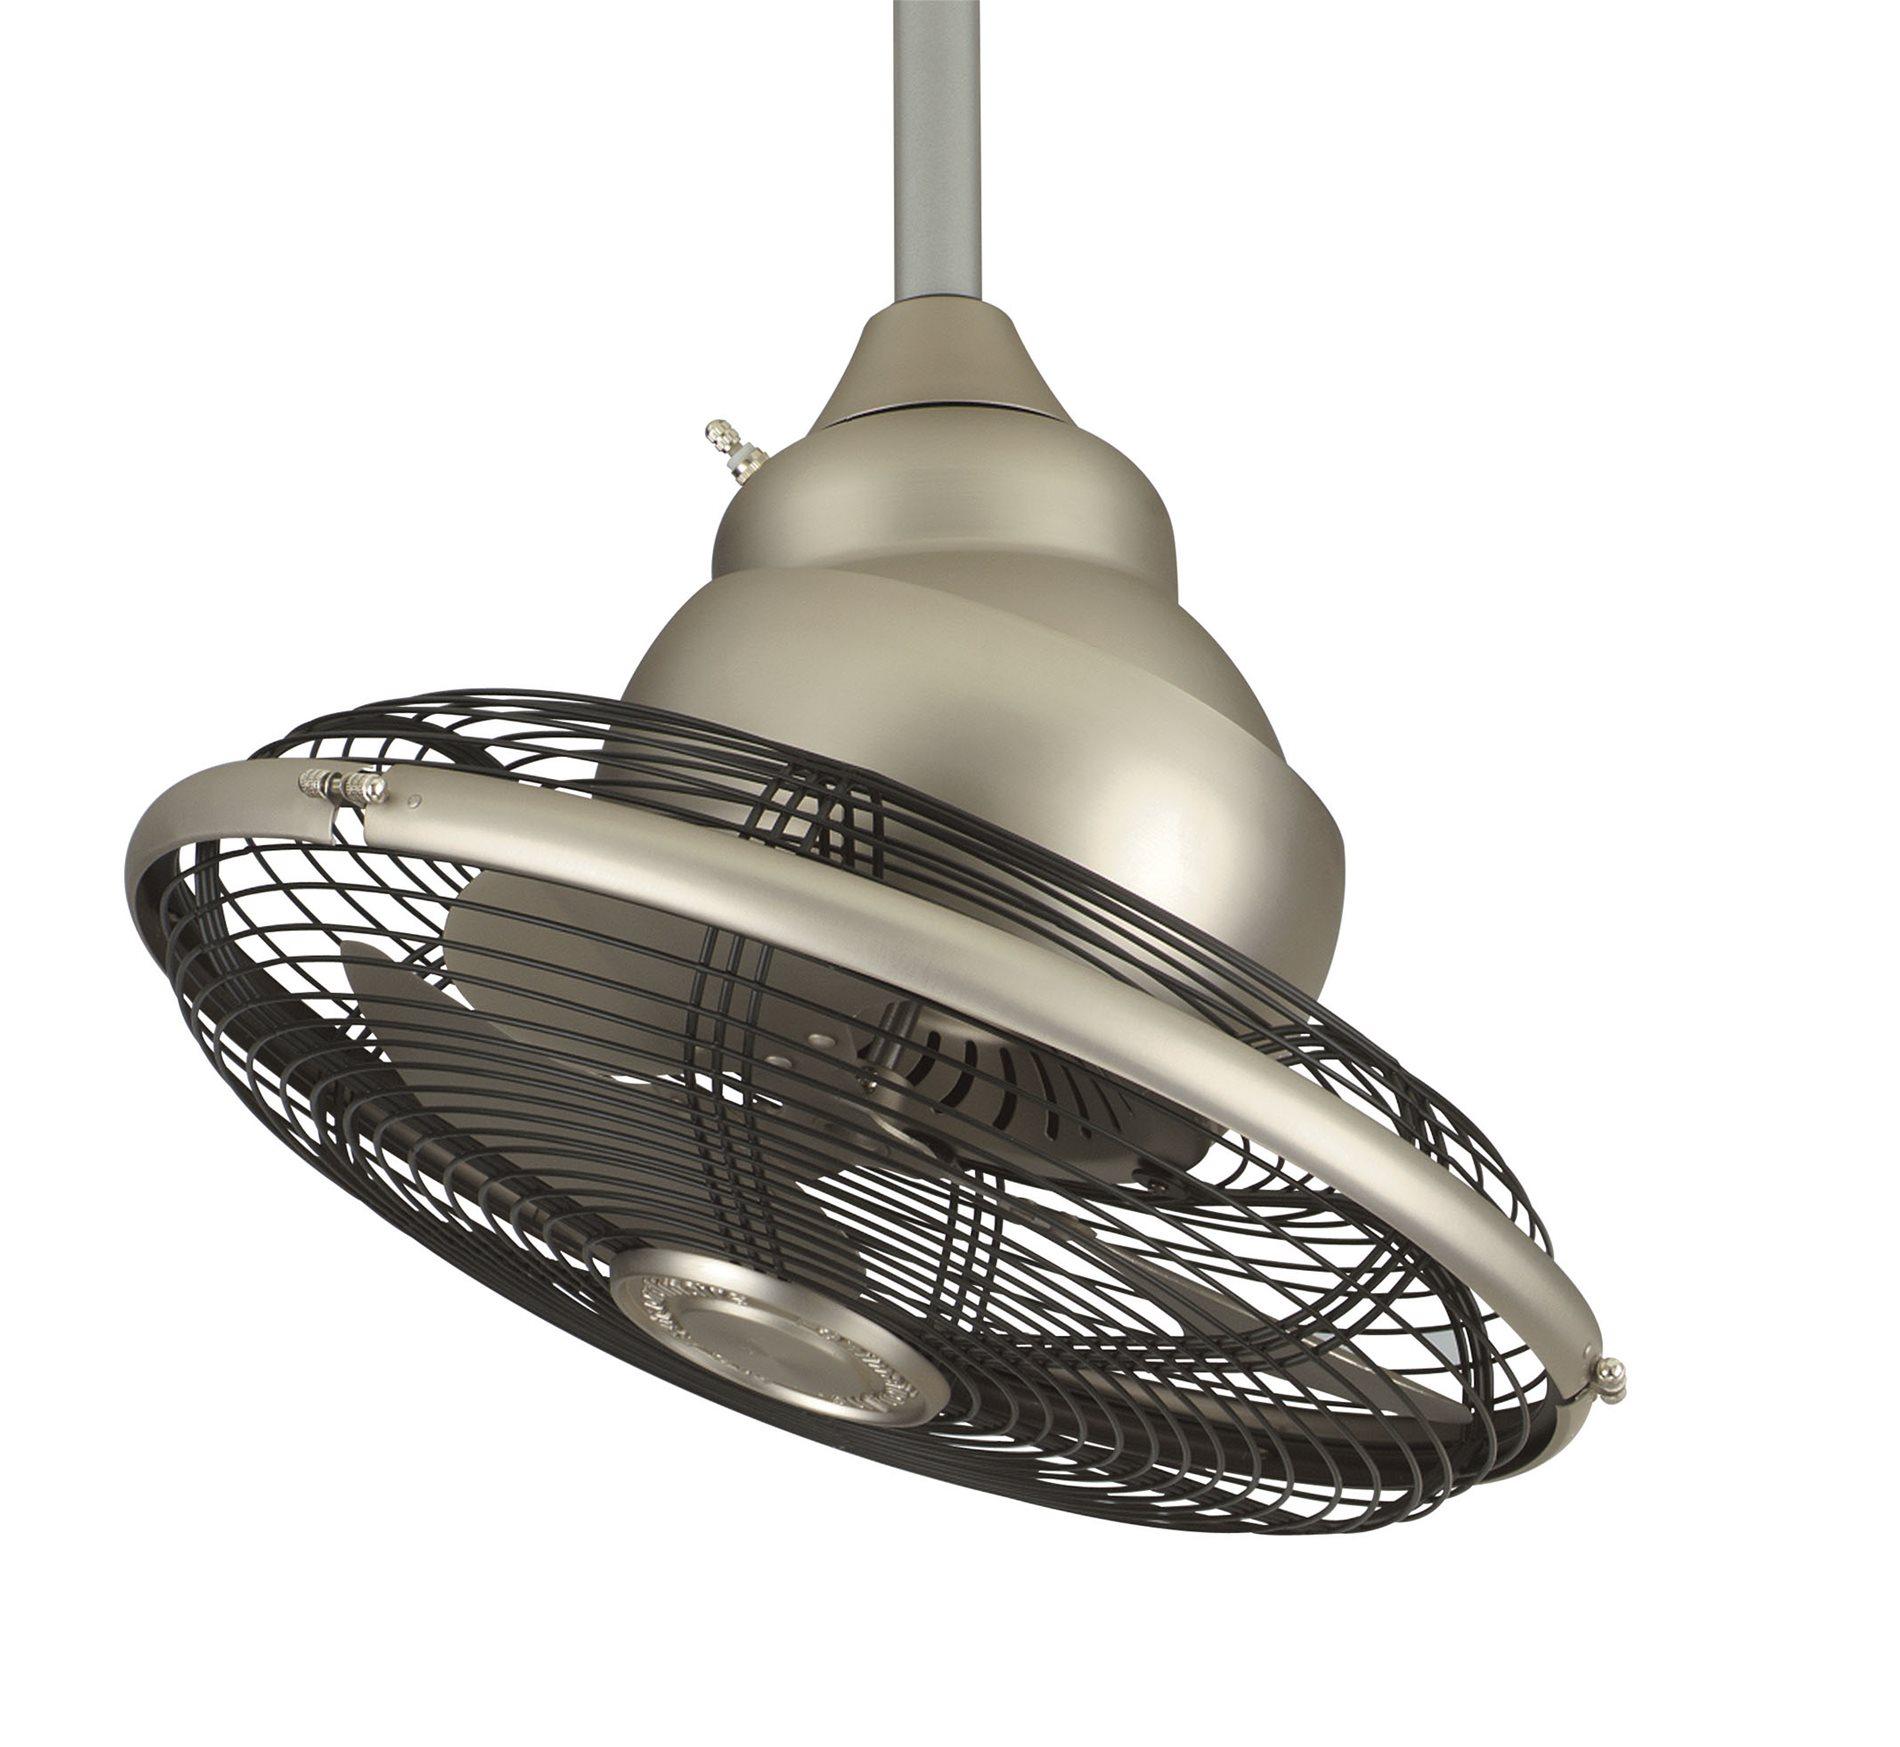 Fanimation OF110 Extraordinaire Tropical Ceiling Fan FM OF110